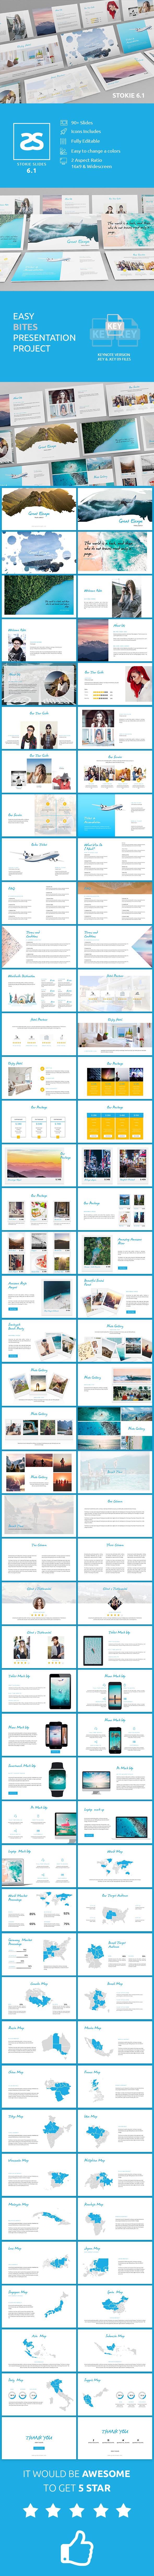 GraphicRiver Travel Agency Keynote Template 6.1 20859922